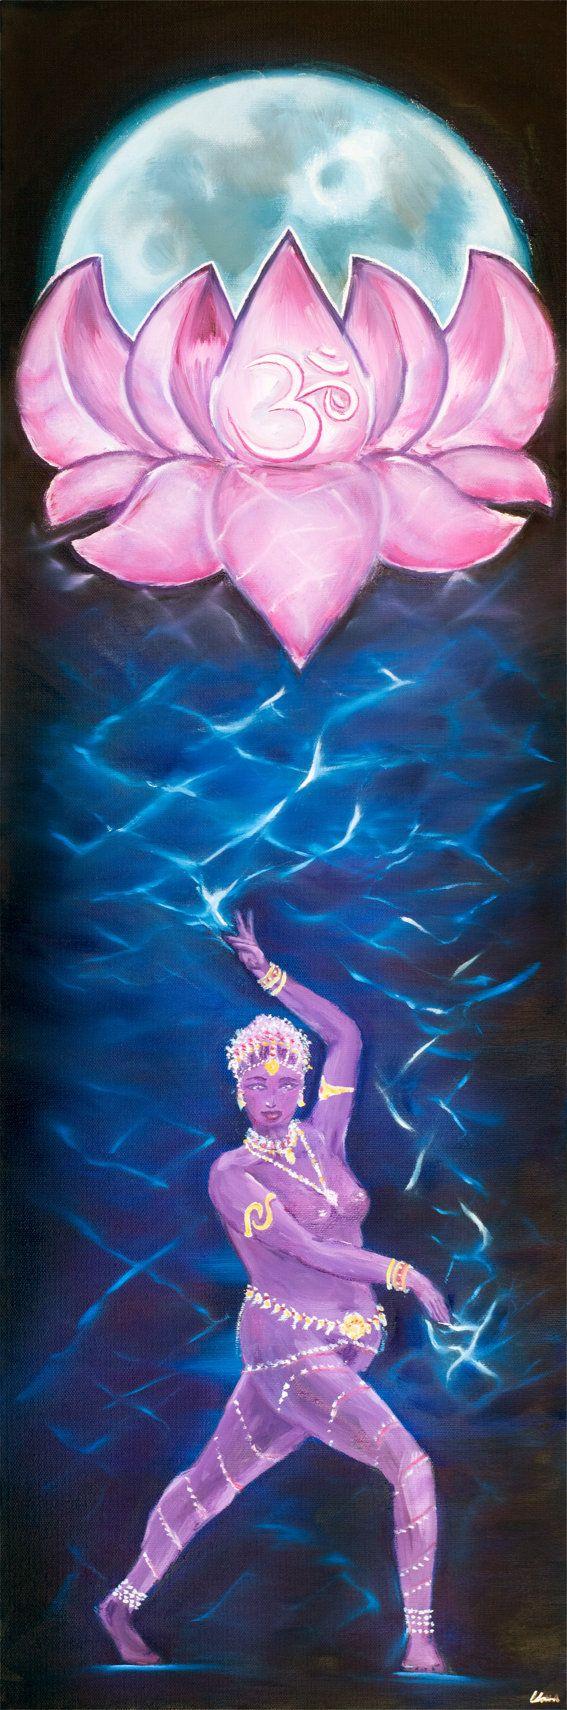 Saroj  Lotus Moon Dancer Series by MissSharda on Etsy